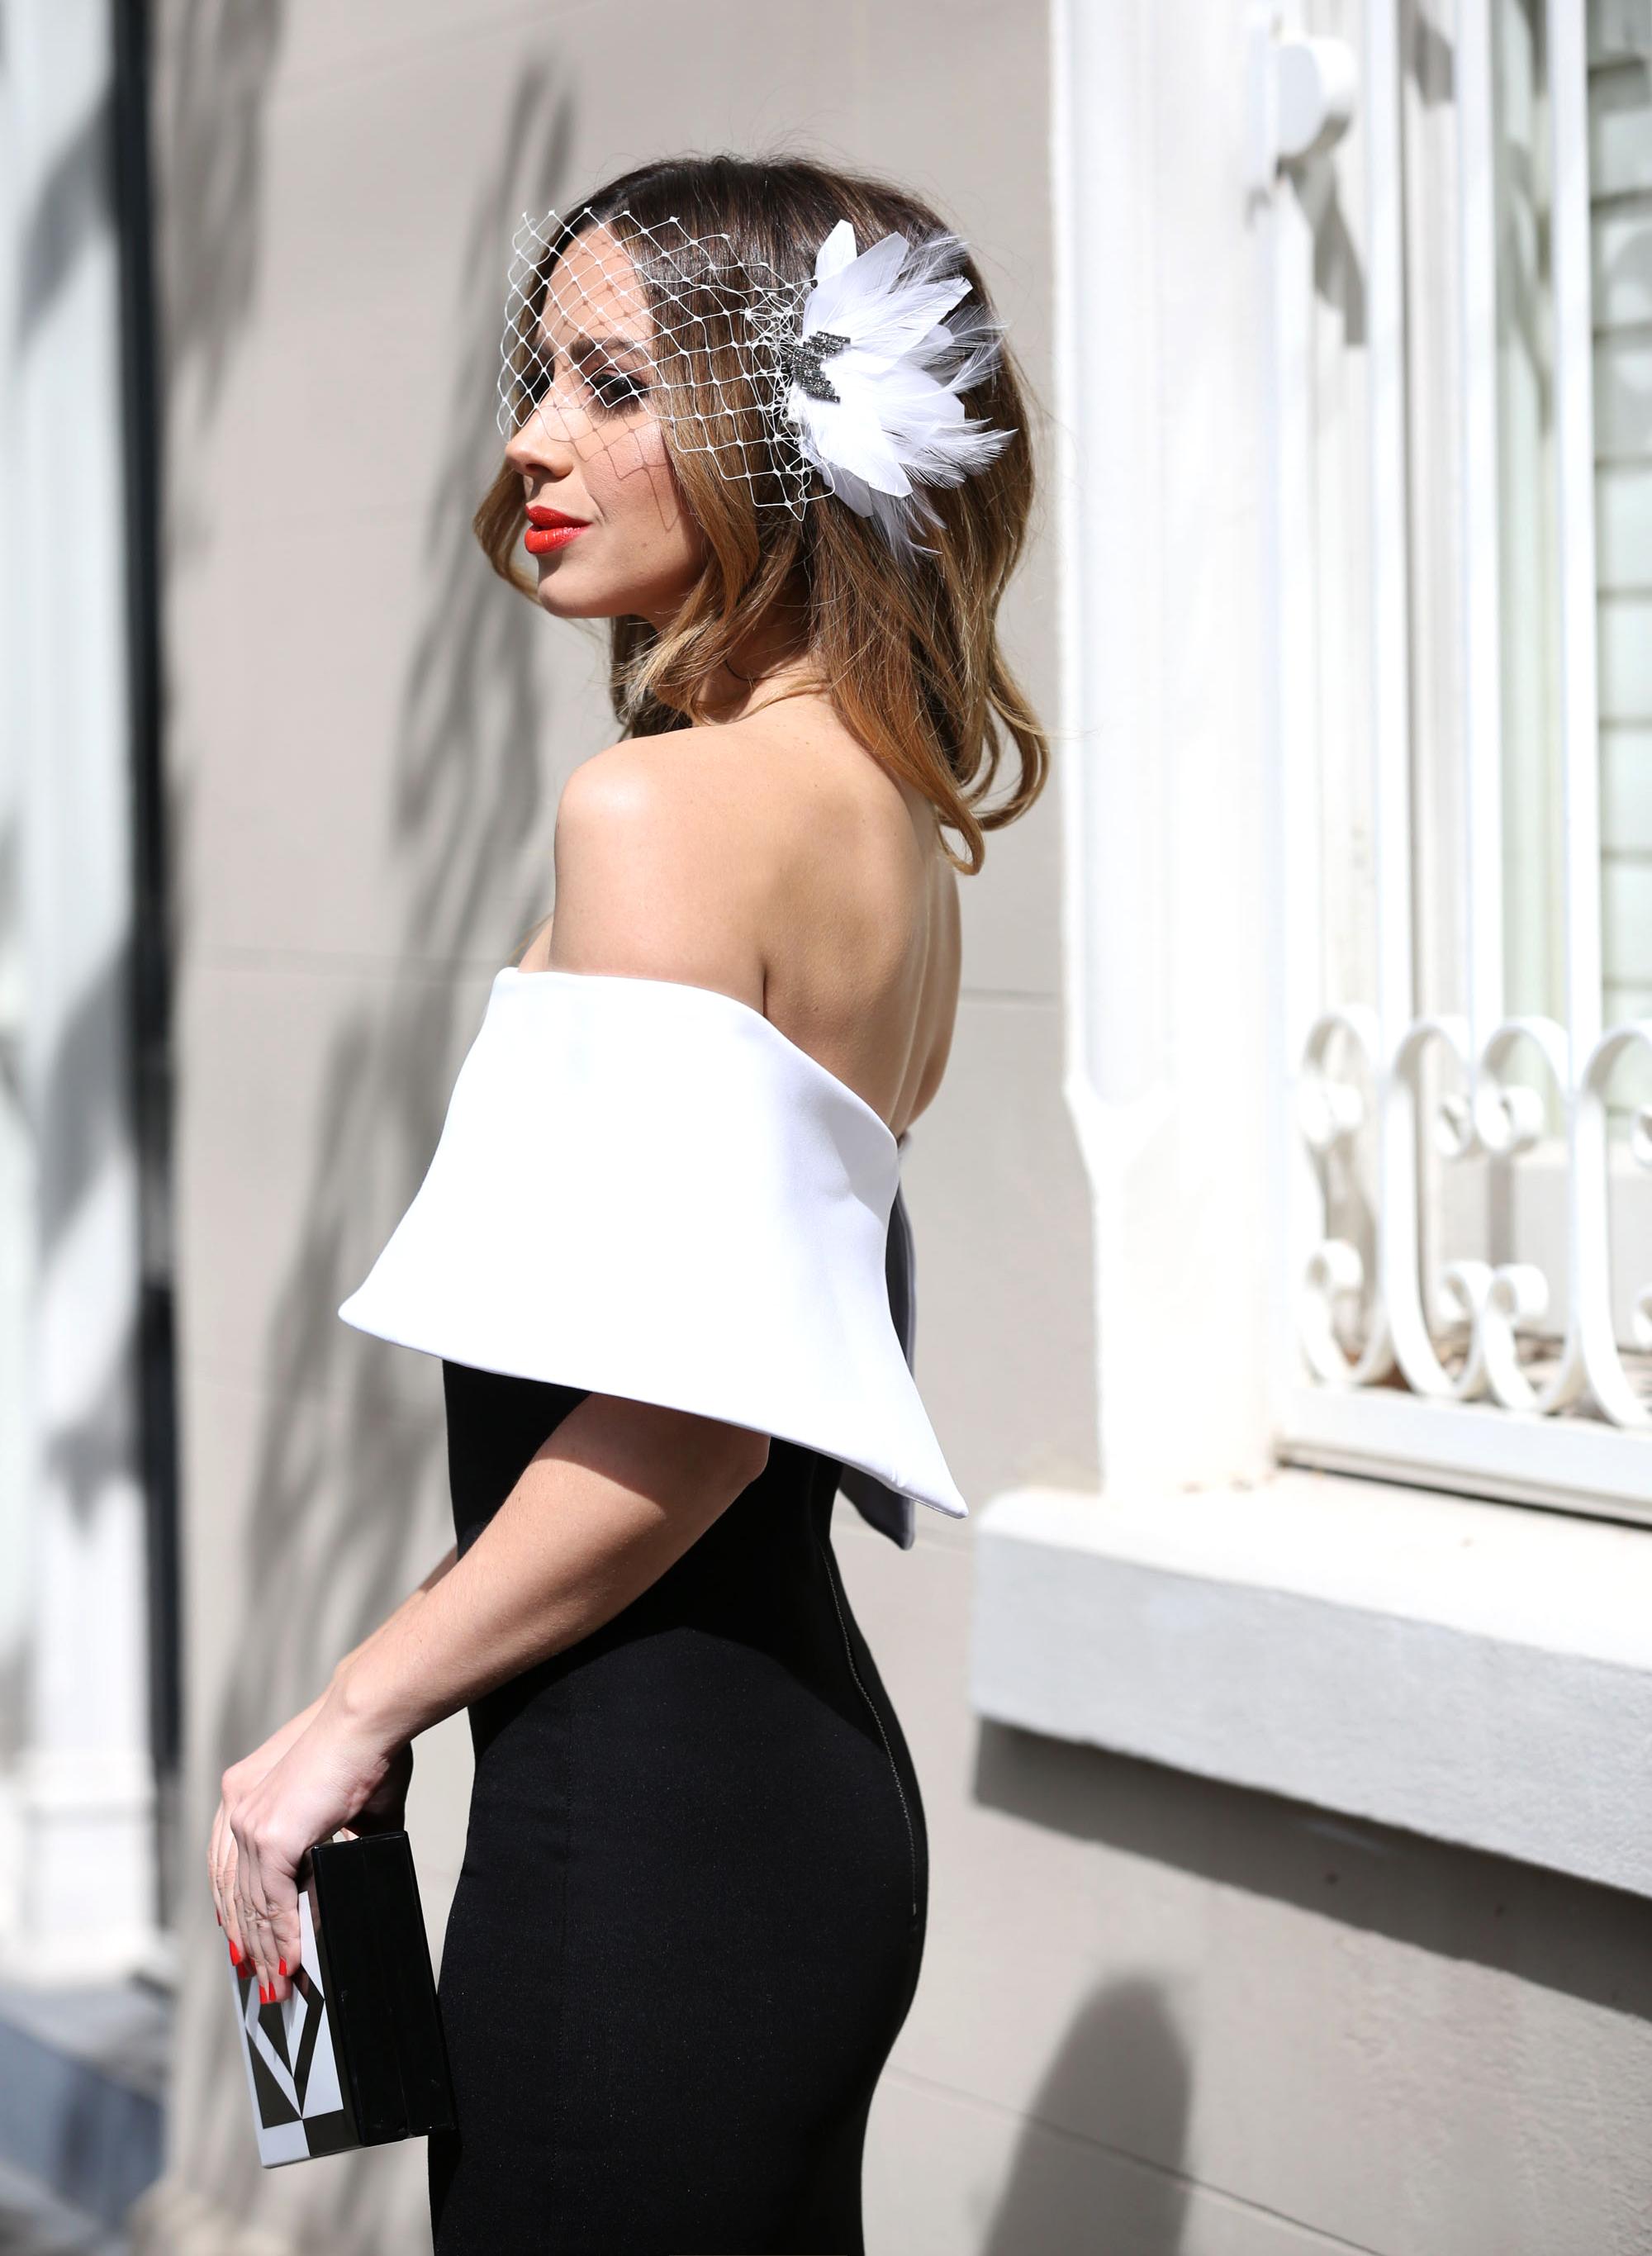 Derby Day Fashion by Jasmin Howell on www.friendinfashion.com.au